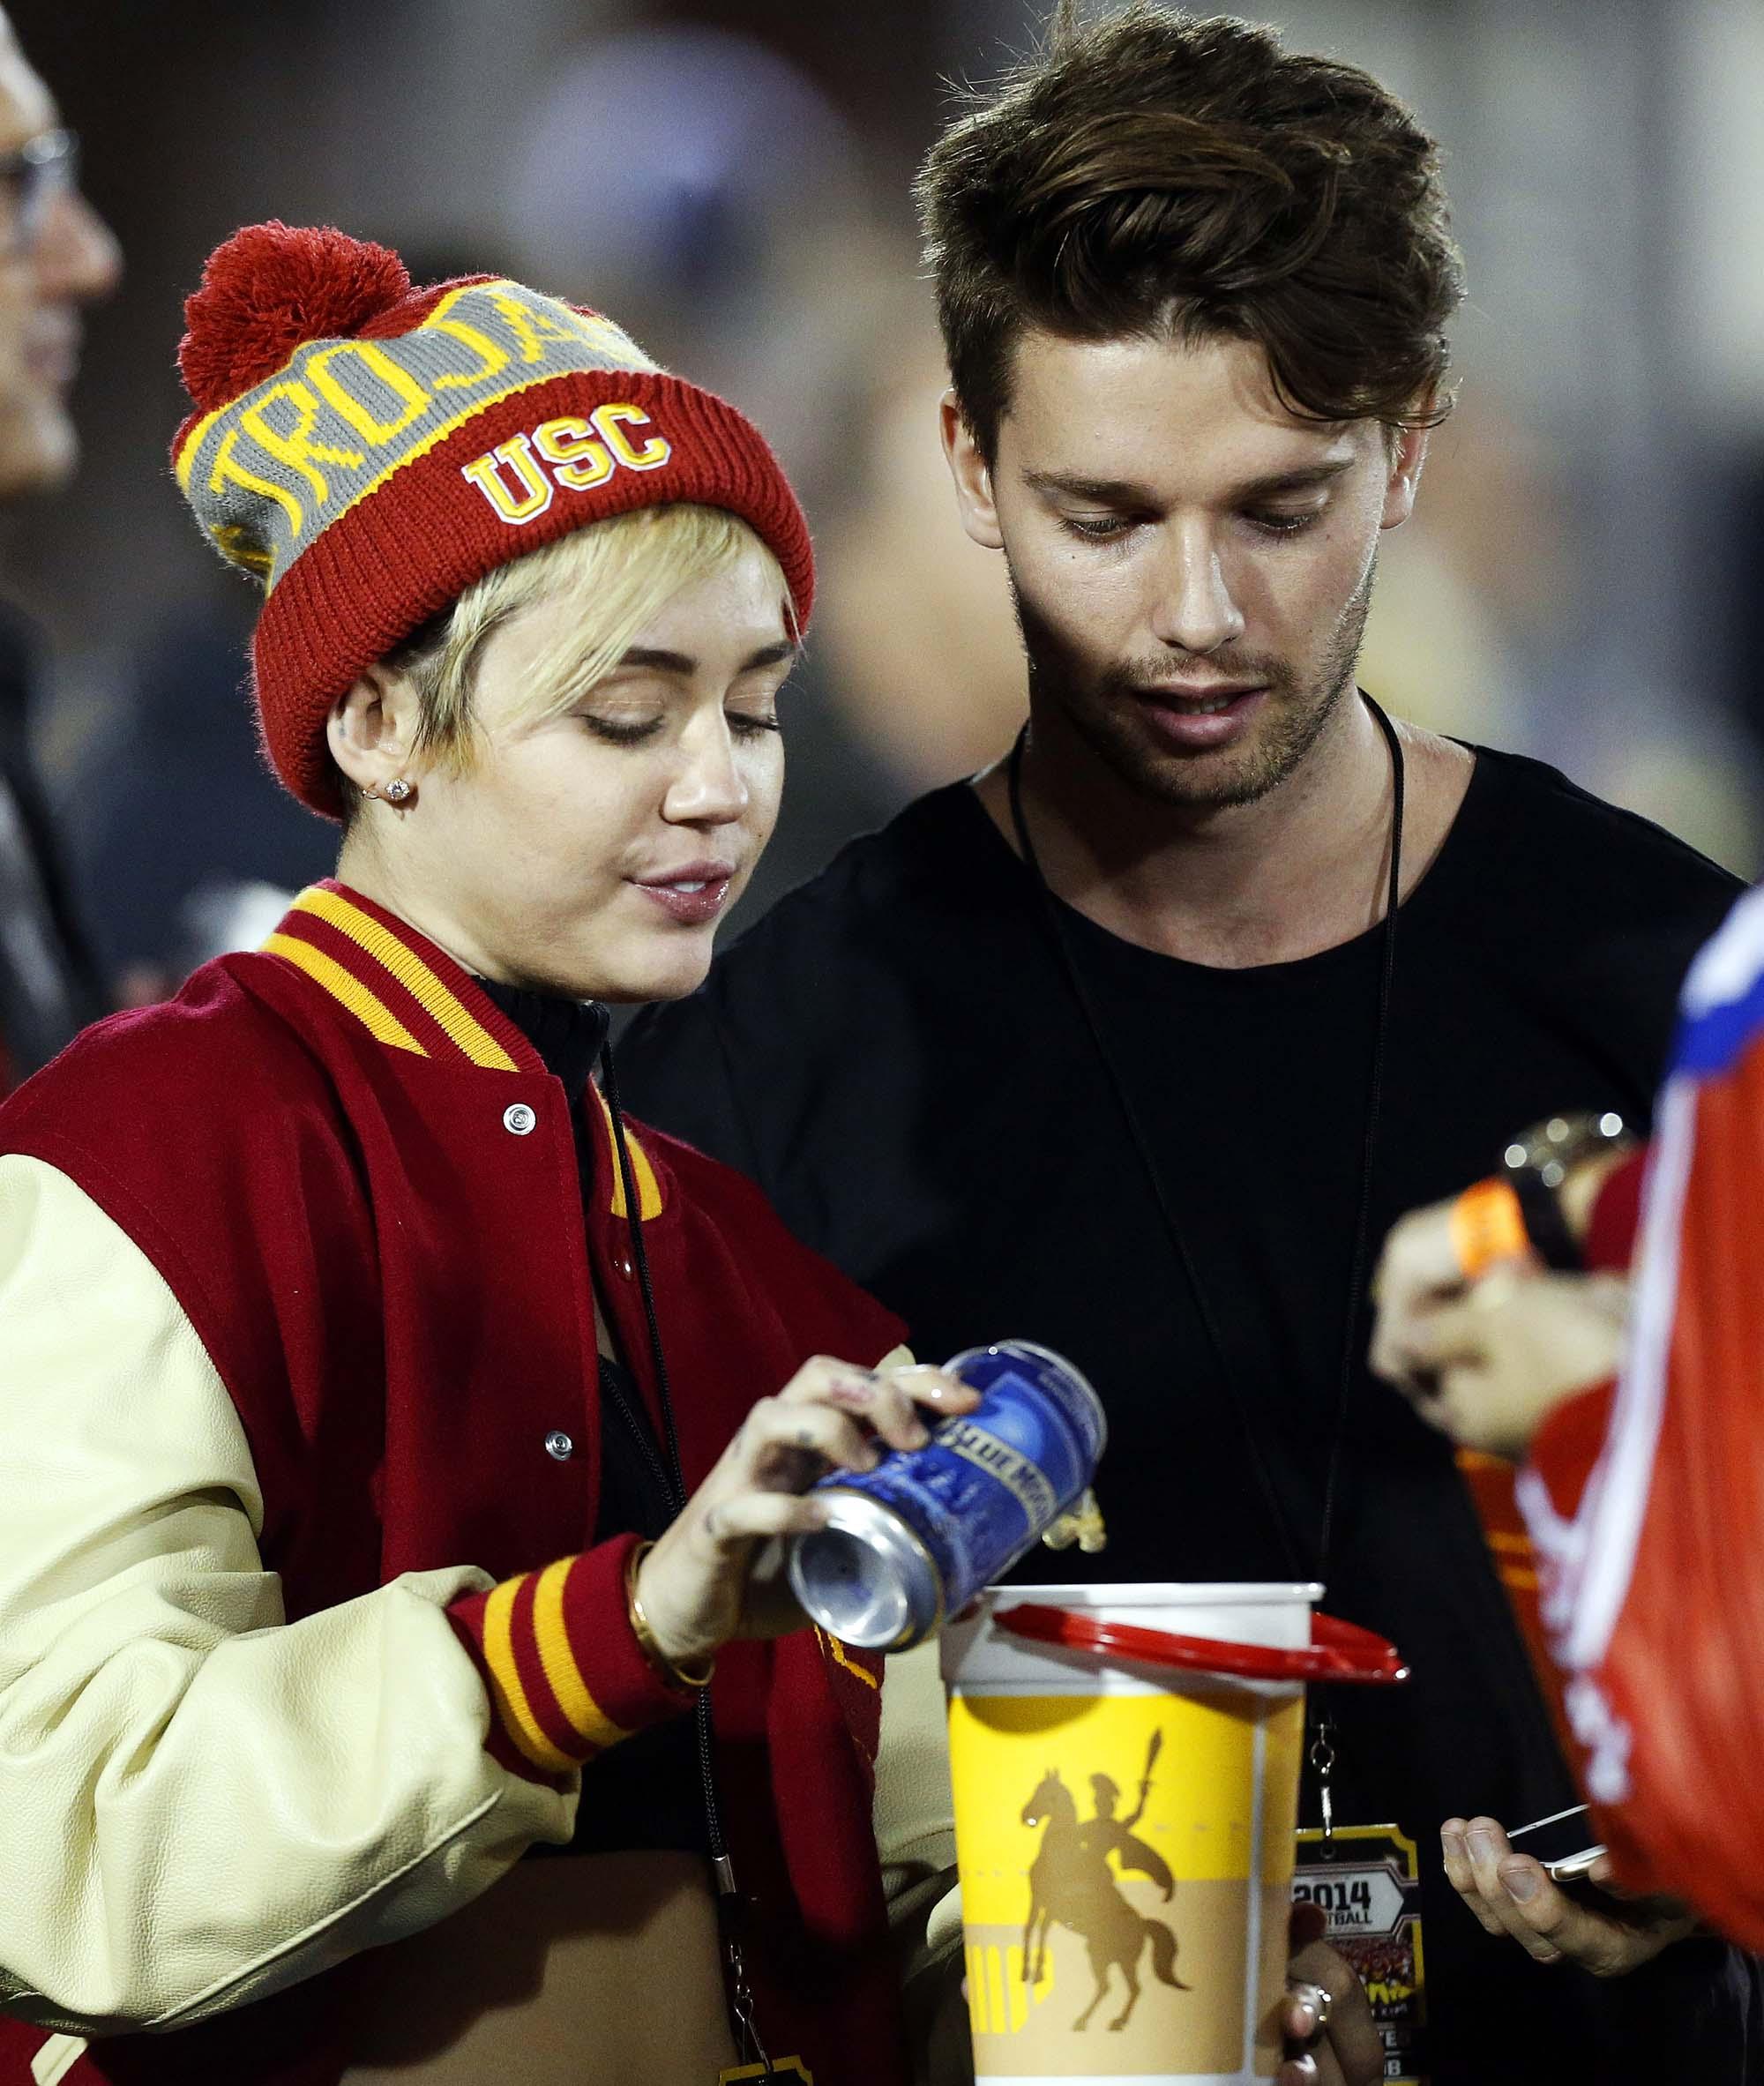 Patrick Schwarzenegger, and Miley Cyrus sighting at USC football game